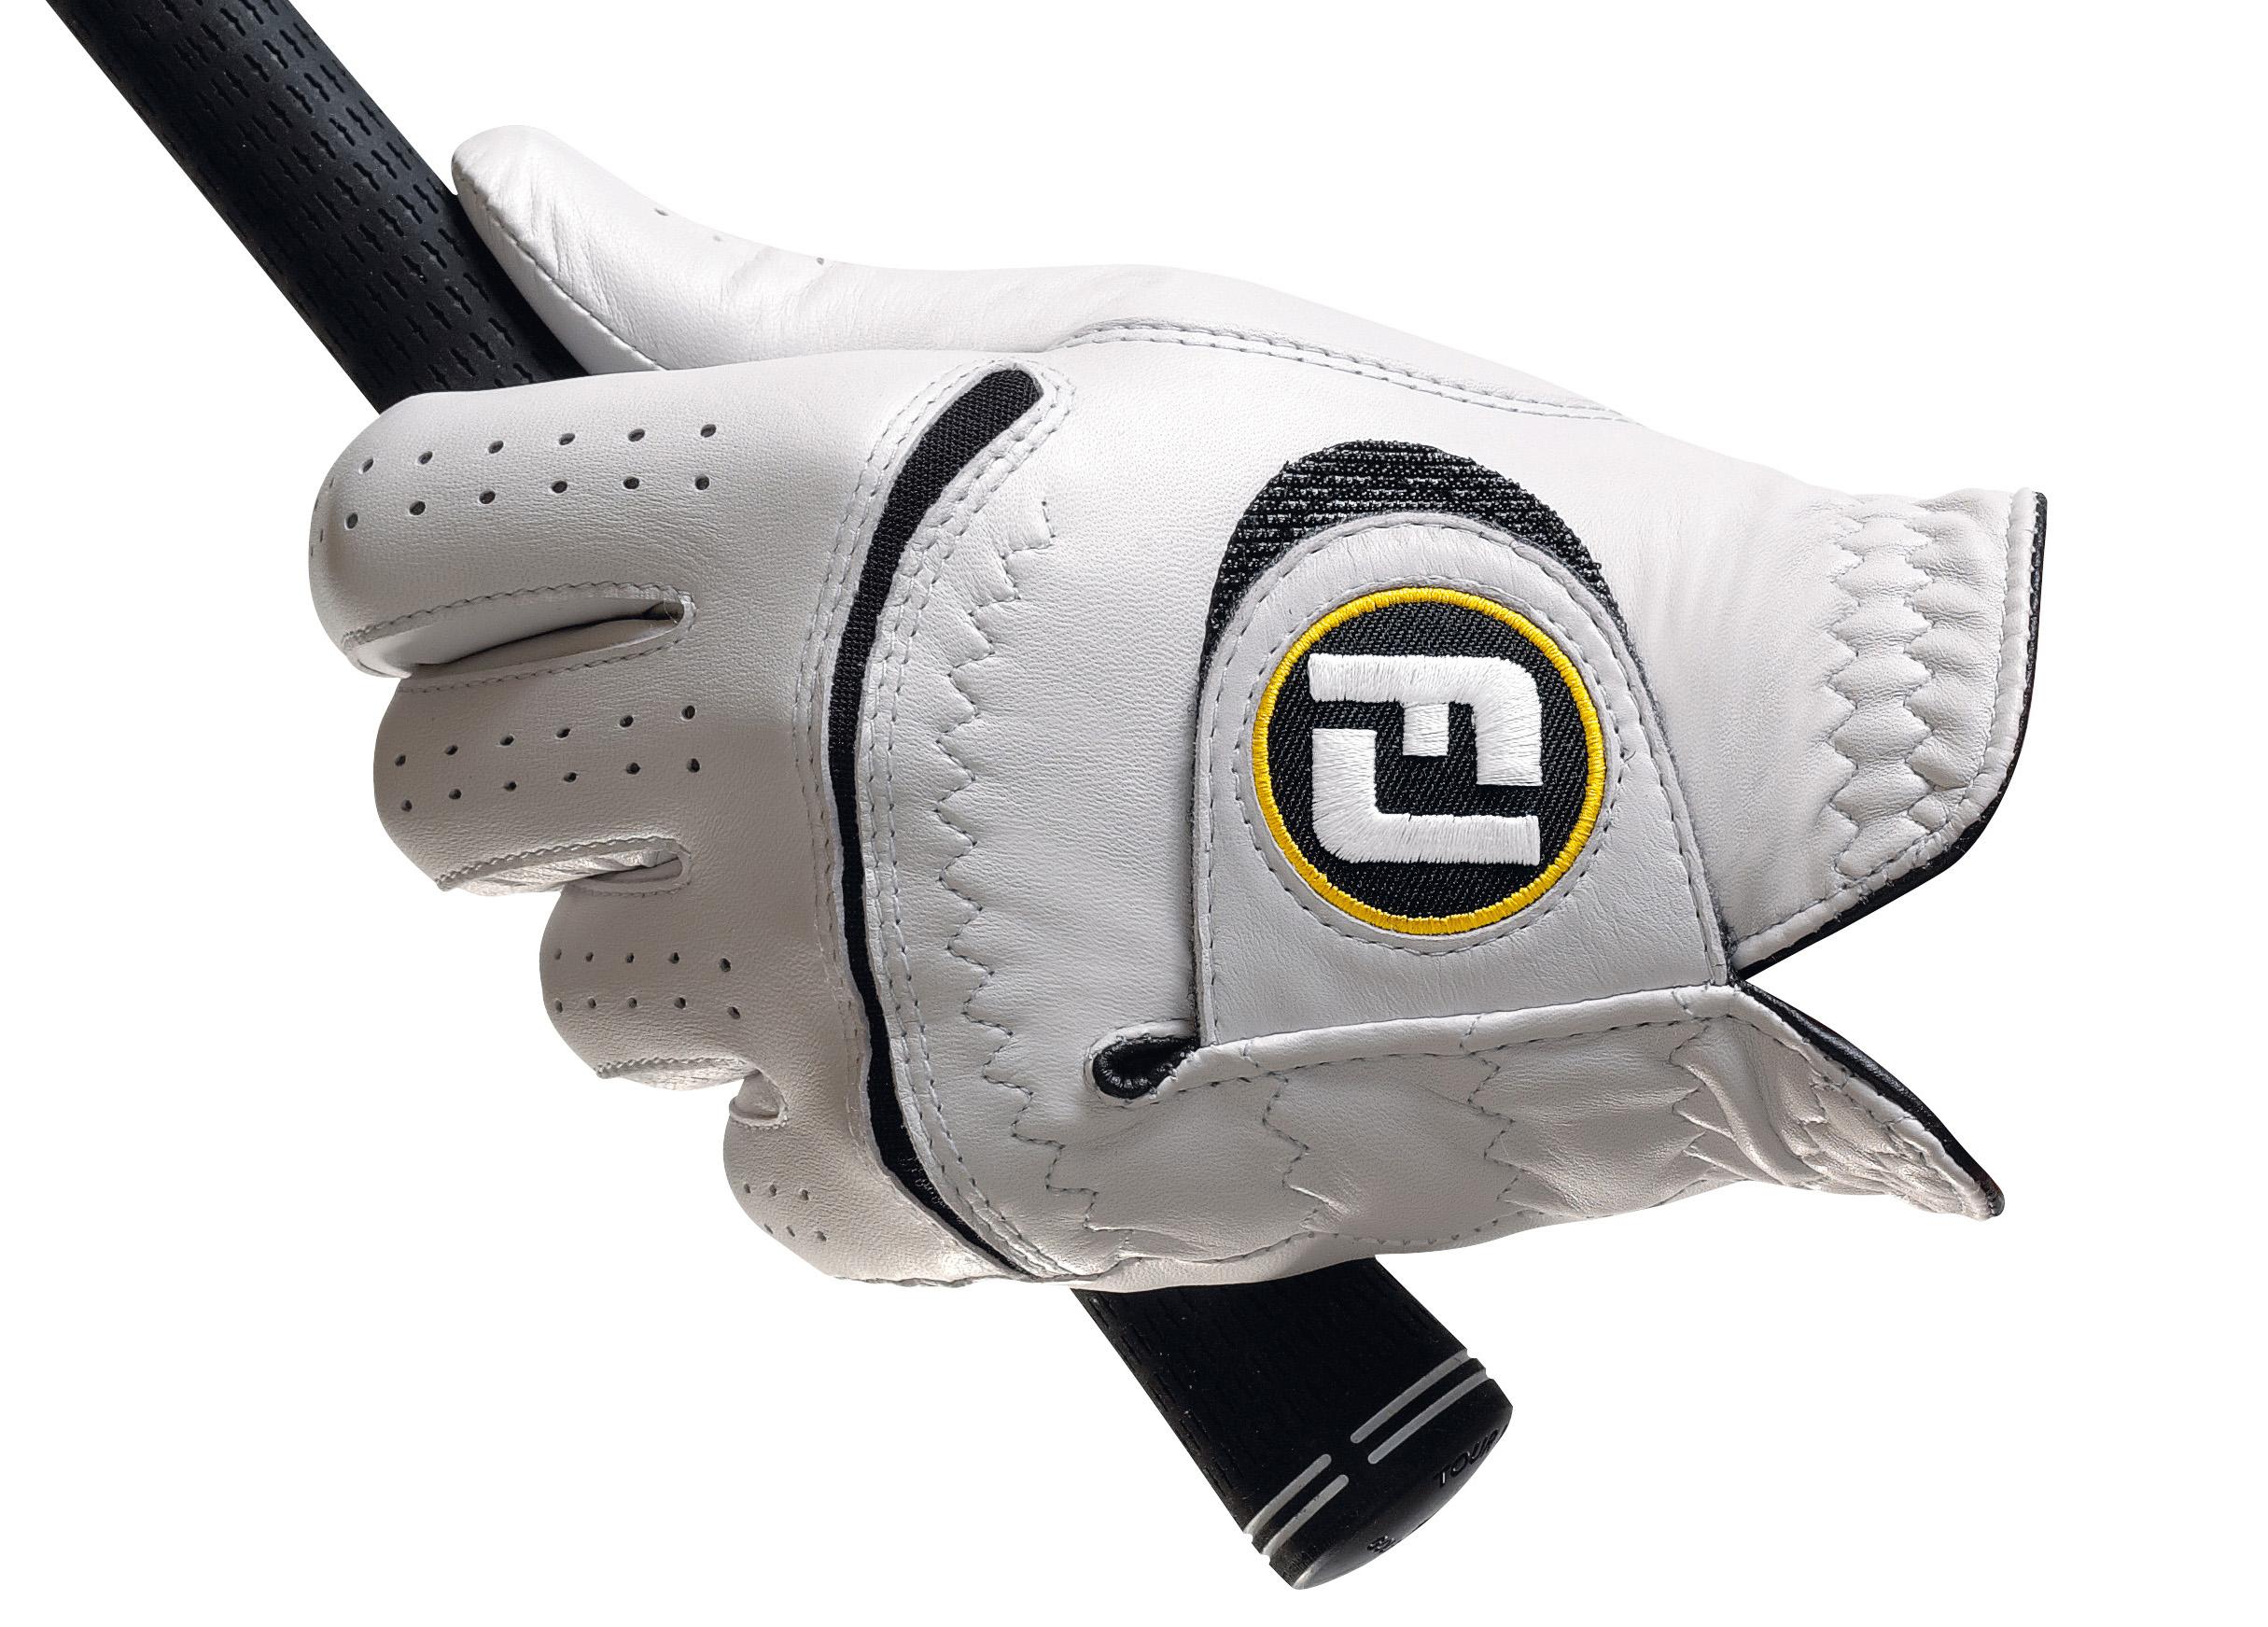 Ladies leather golf gloves uk - Footjoy Stasof Glove